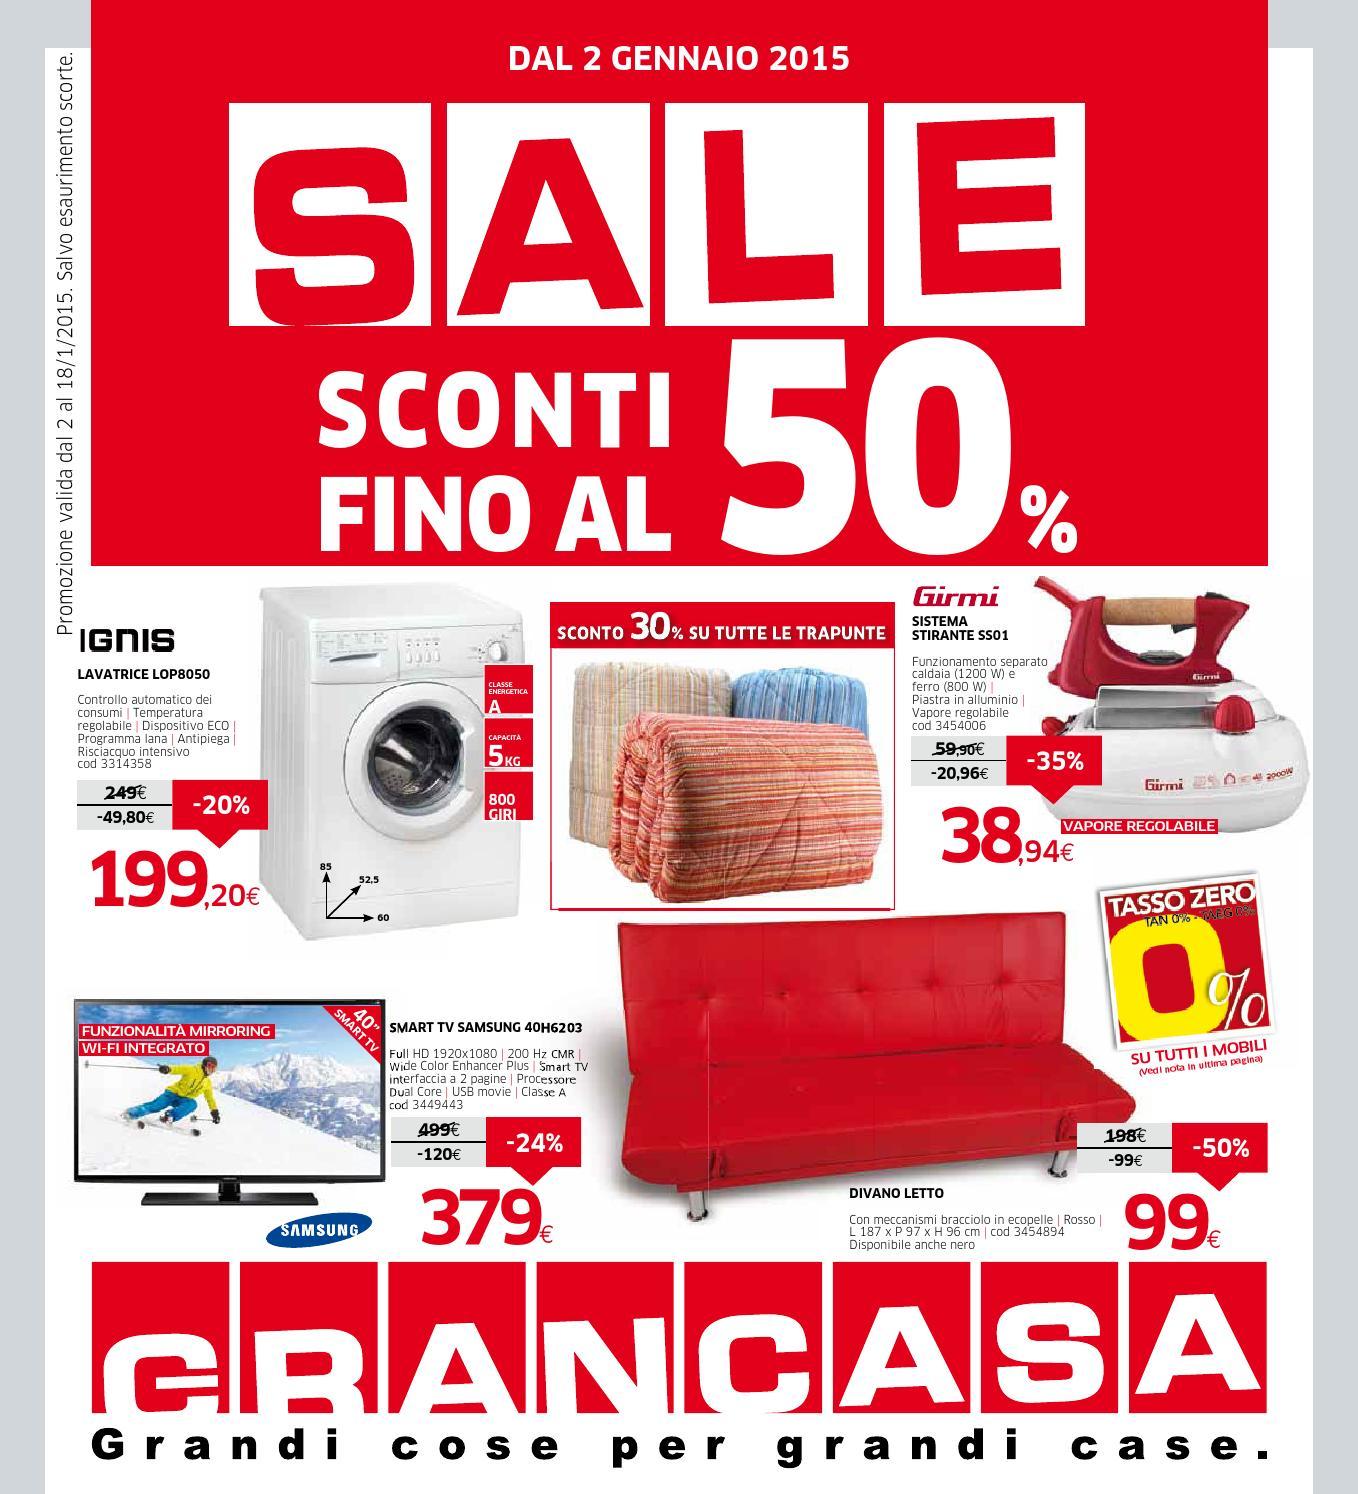 Grancasa 18gen by volavolantino - issuu